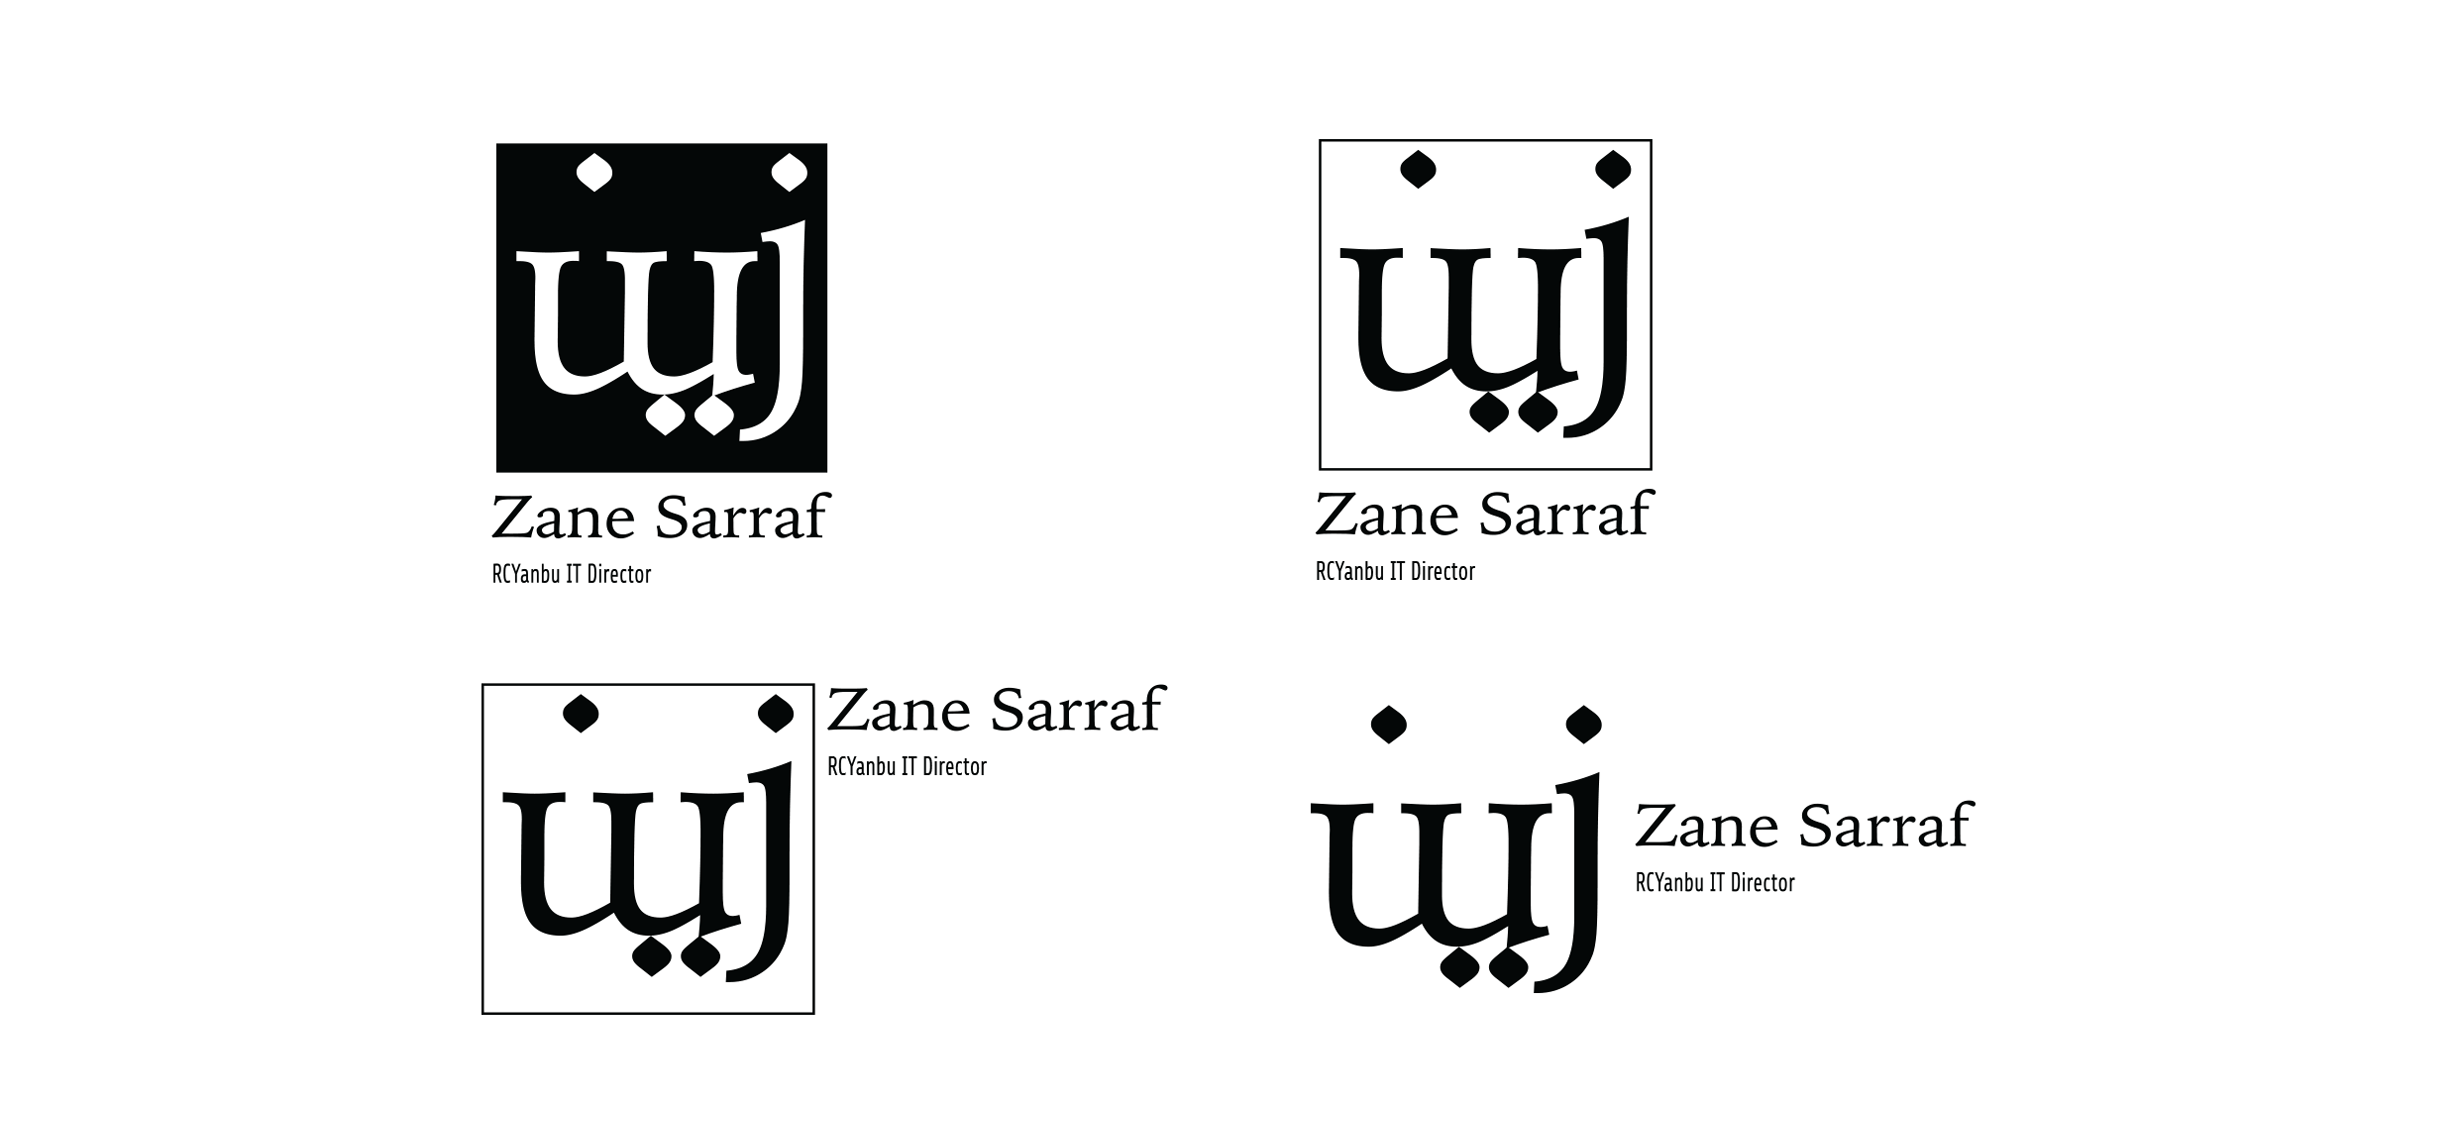 zane sarraf logo variations momenarts